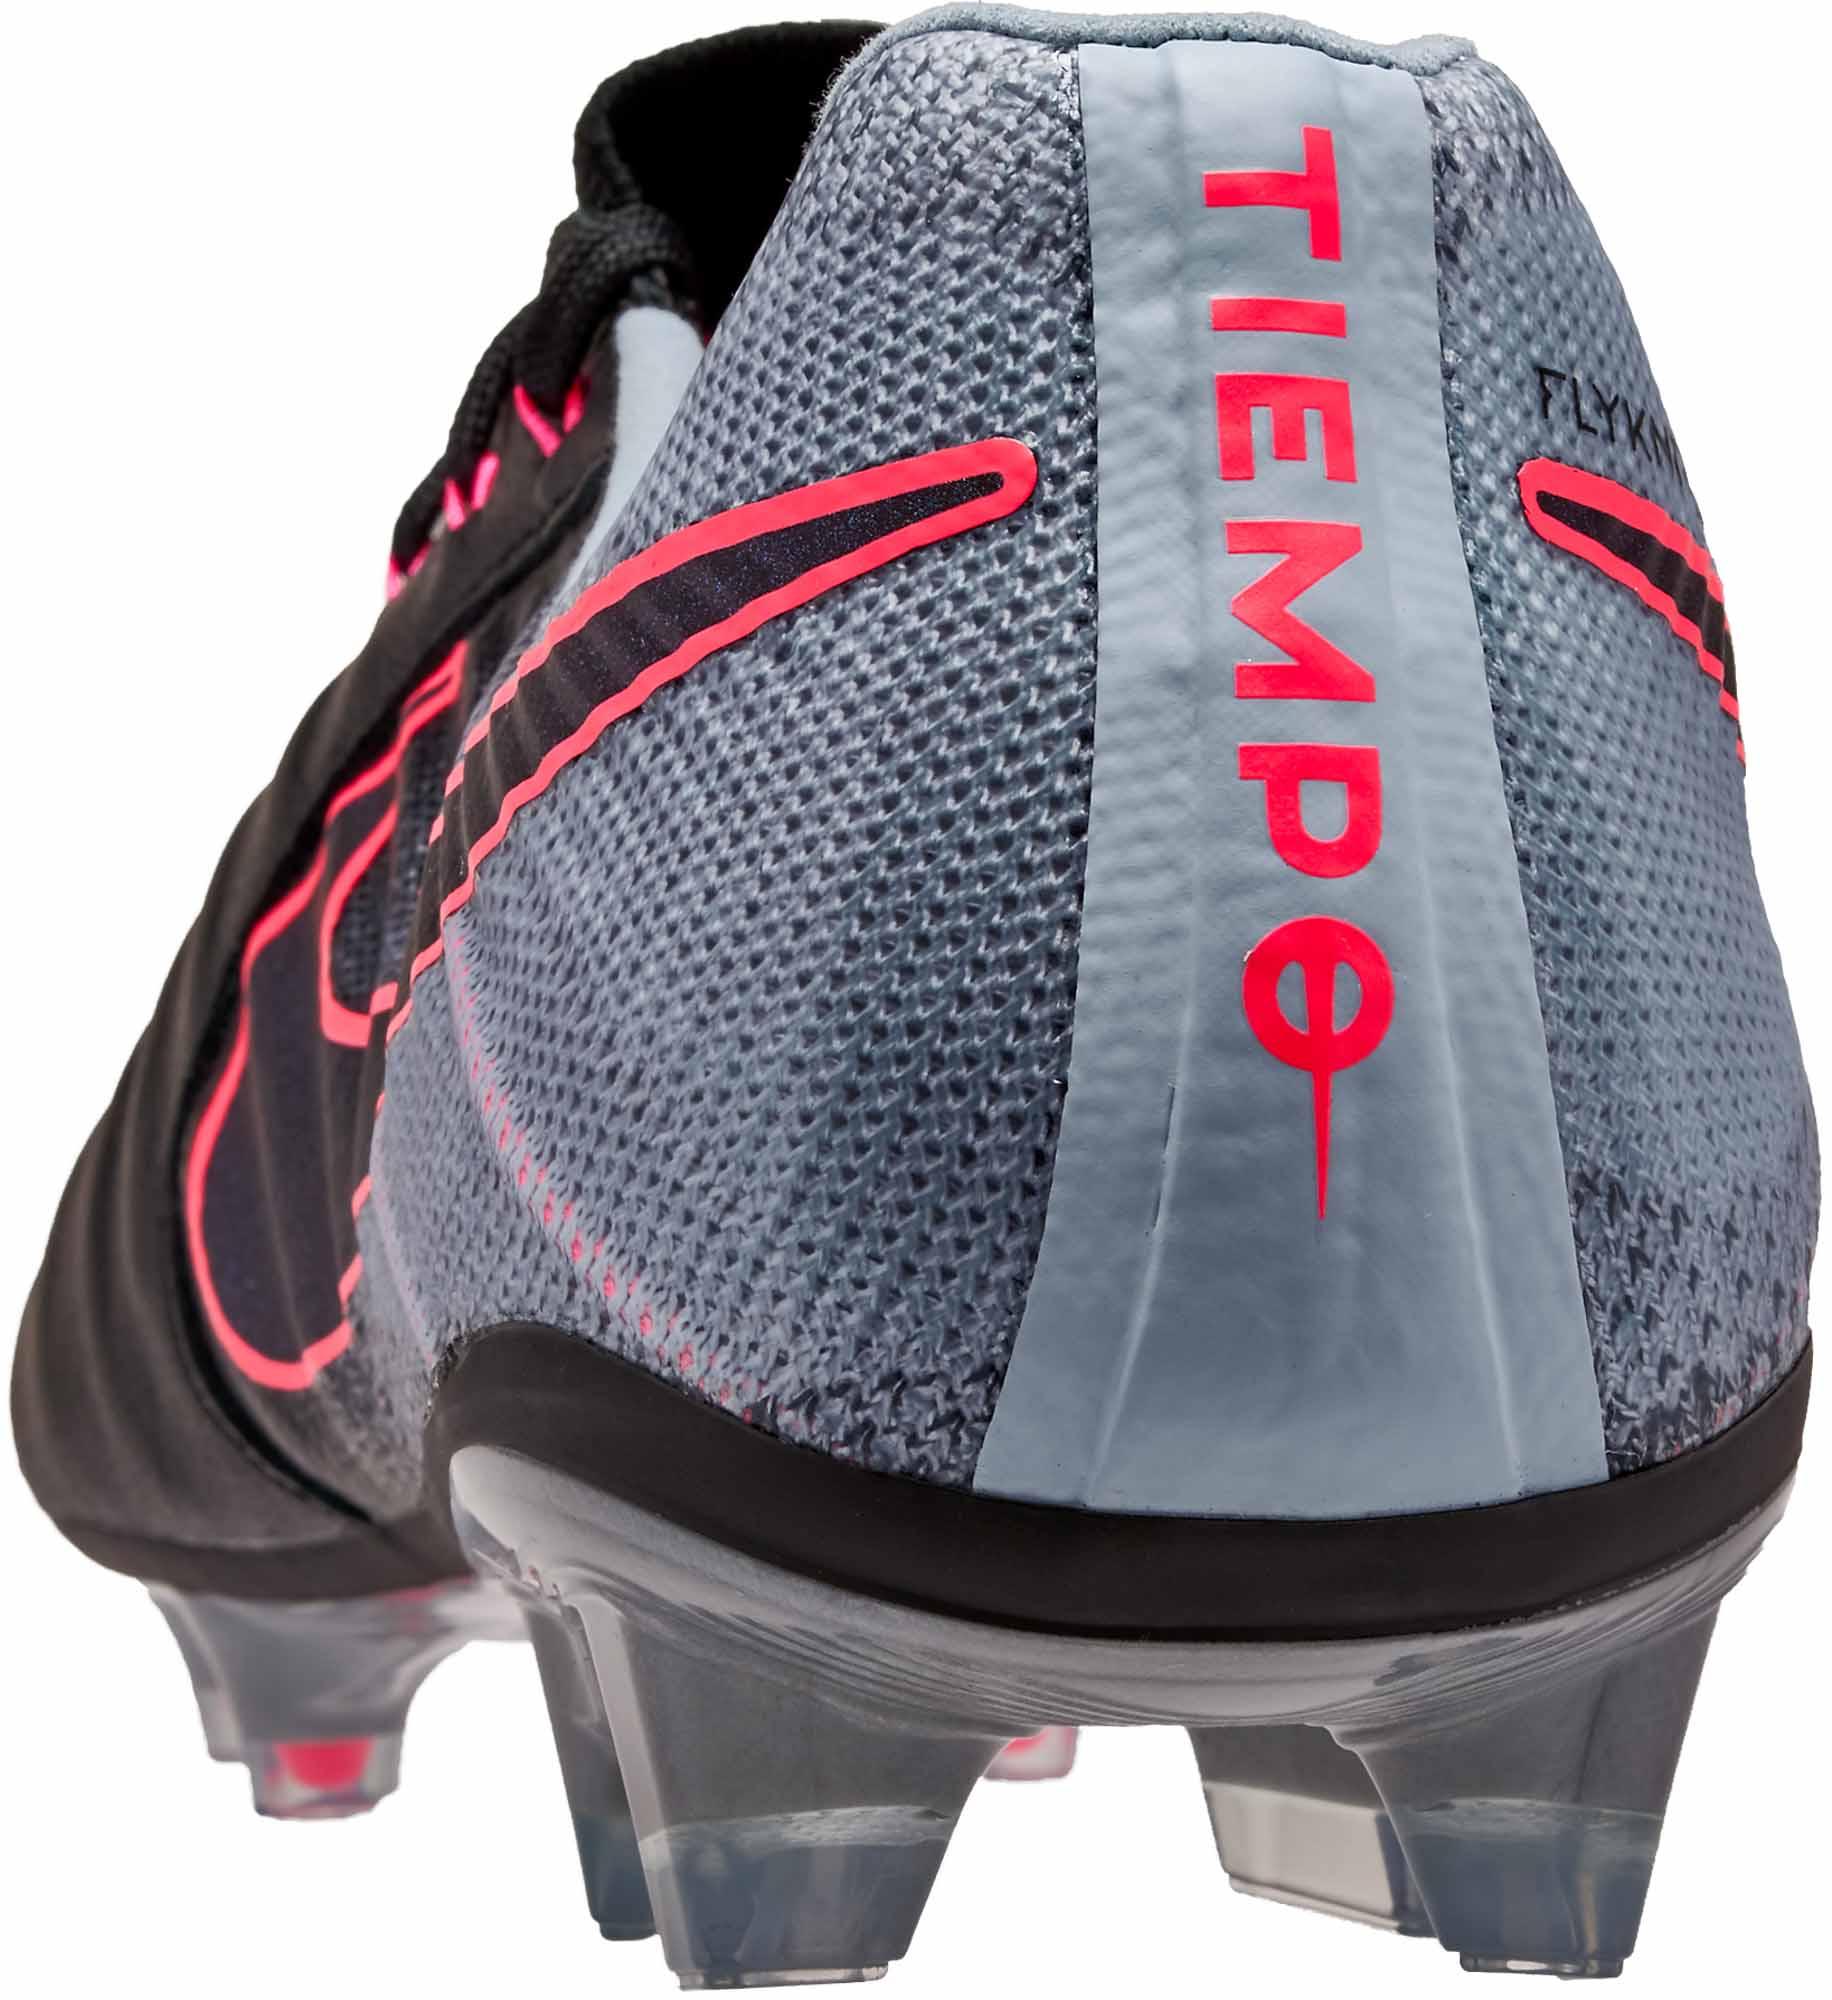 557aac9e43f94 Nike Tiempo Legend VII FG - Black Nike Legends